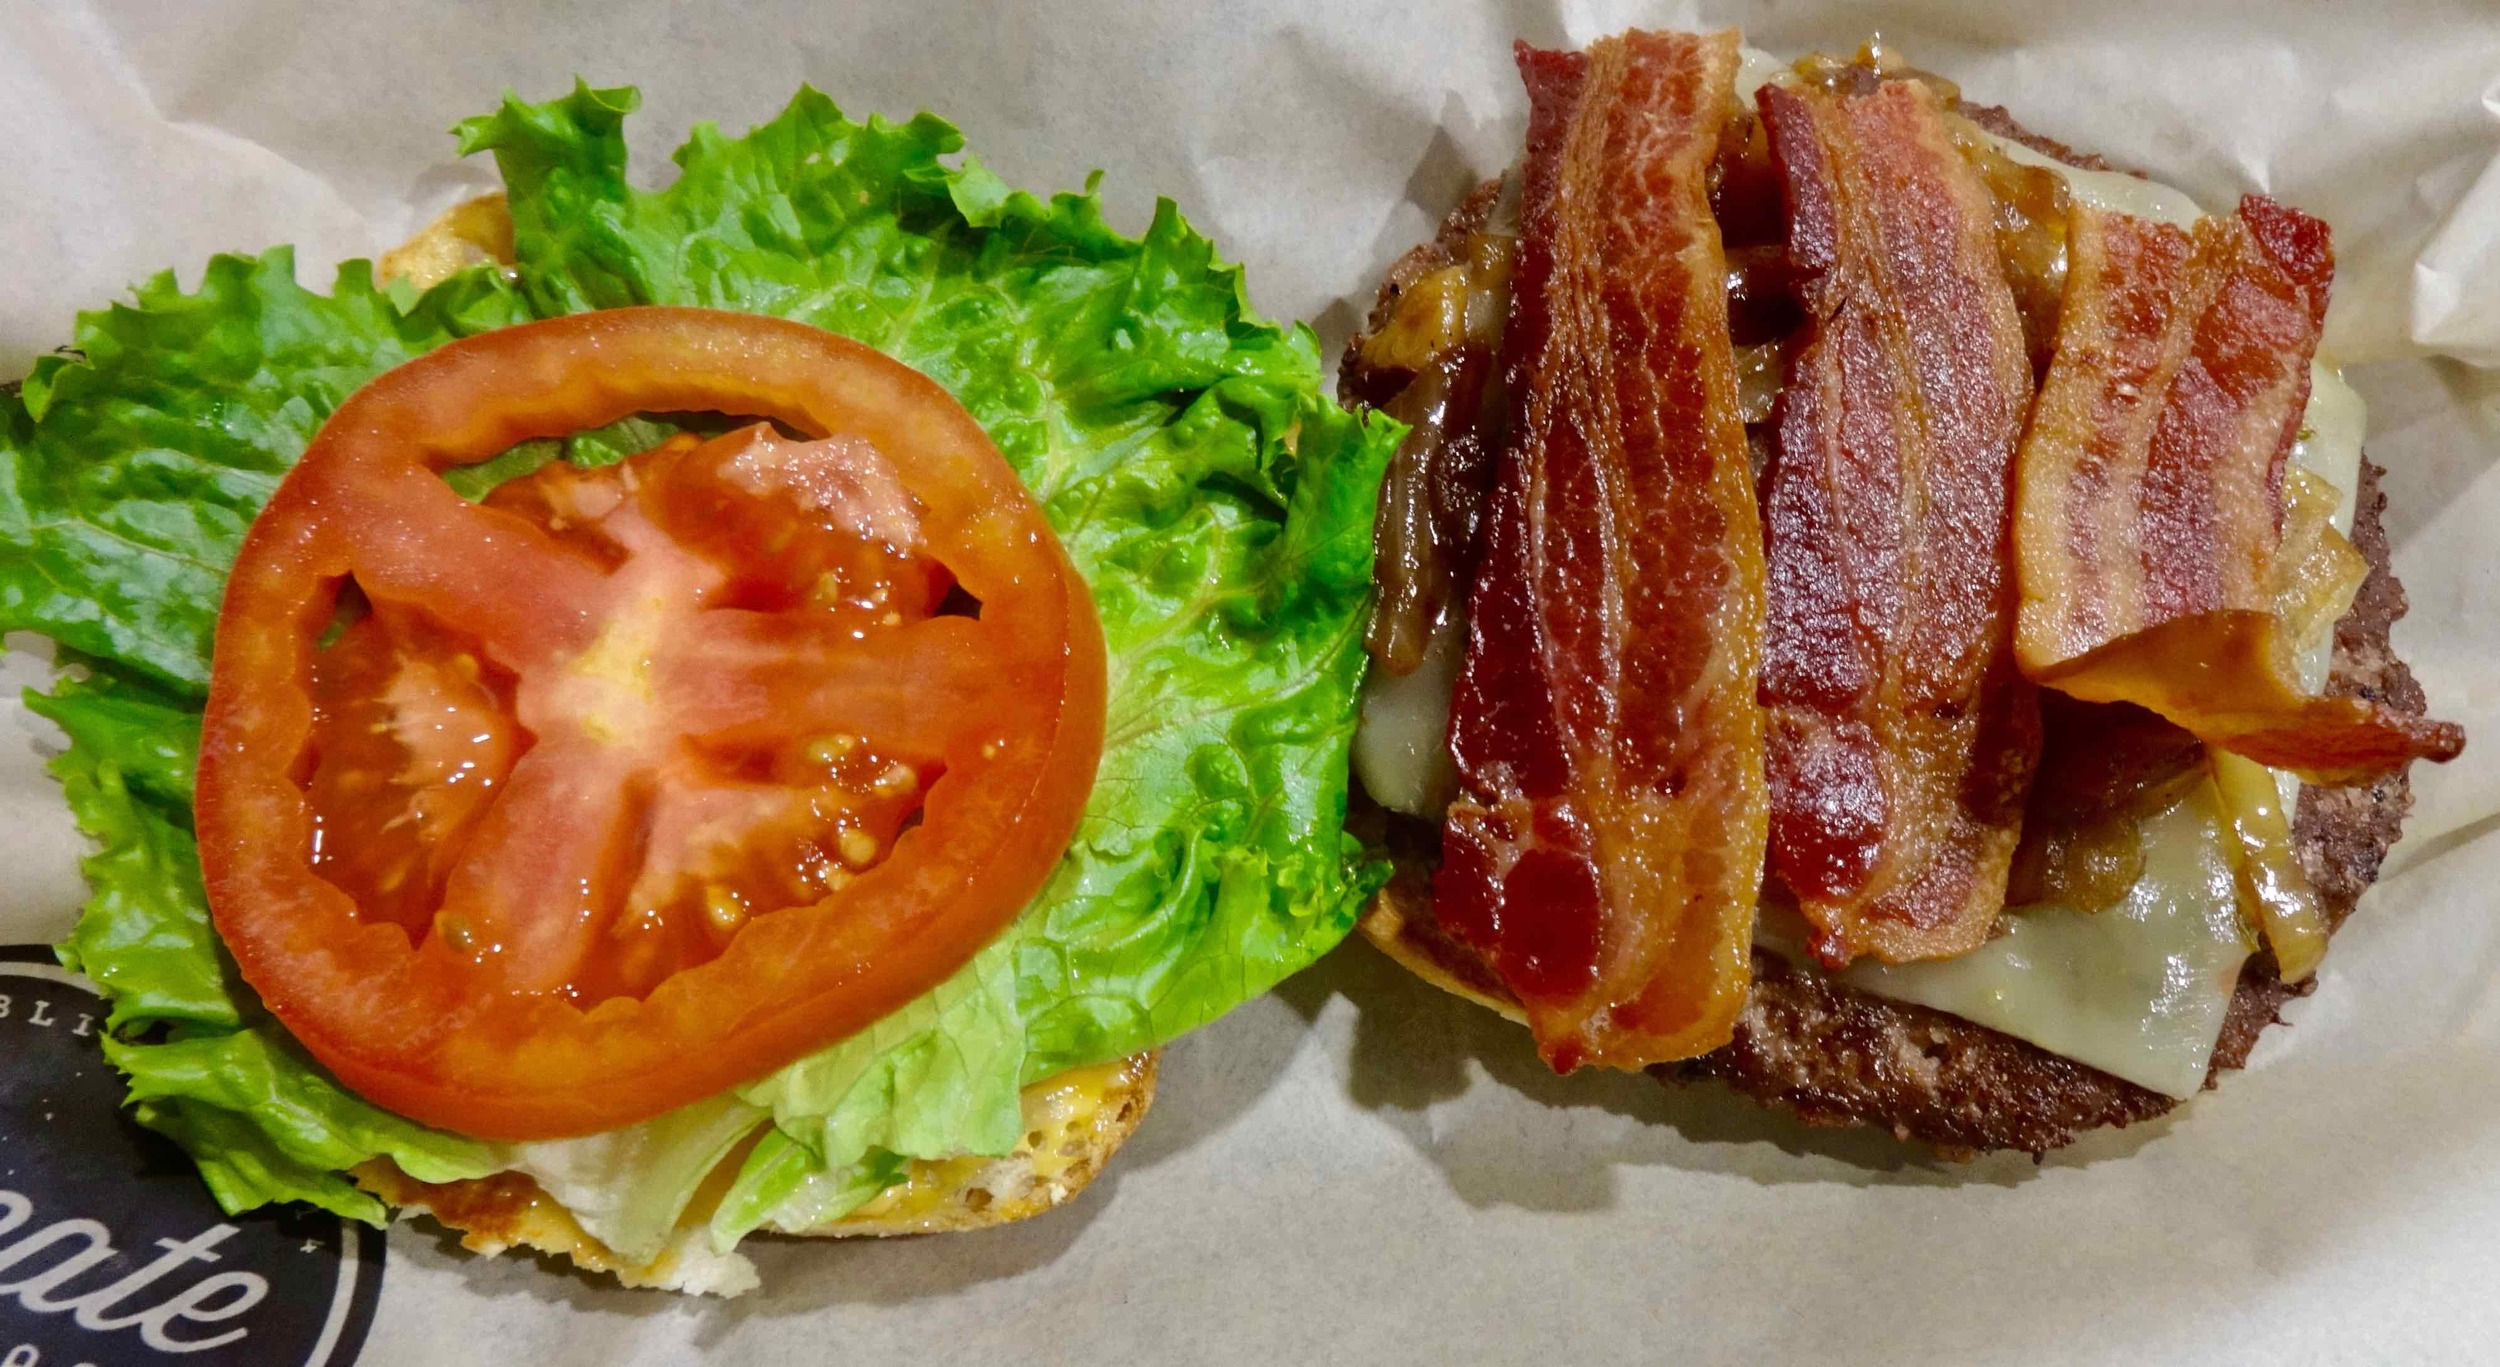 bacon cheeseburger from McCafe